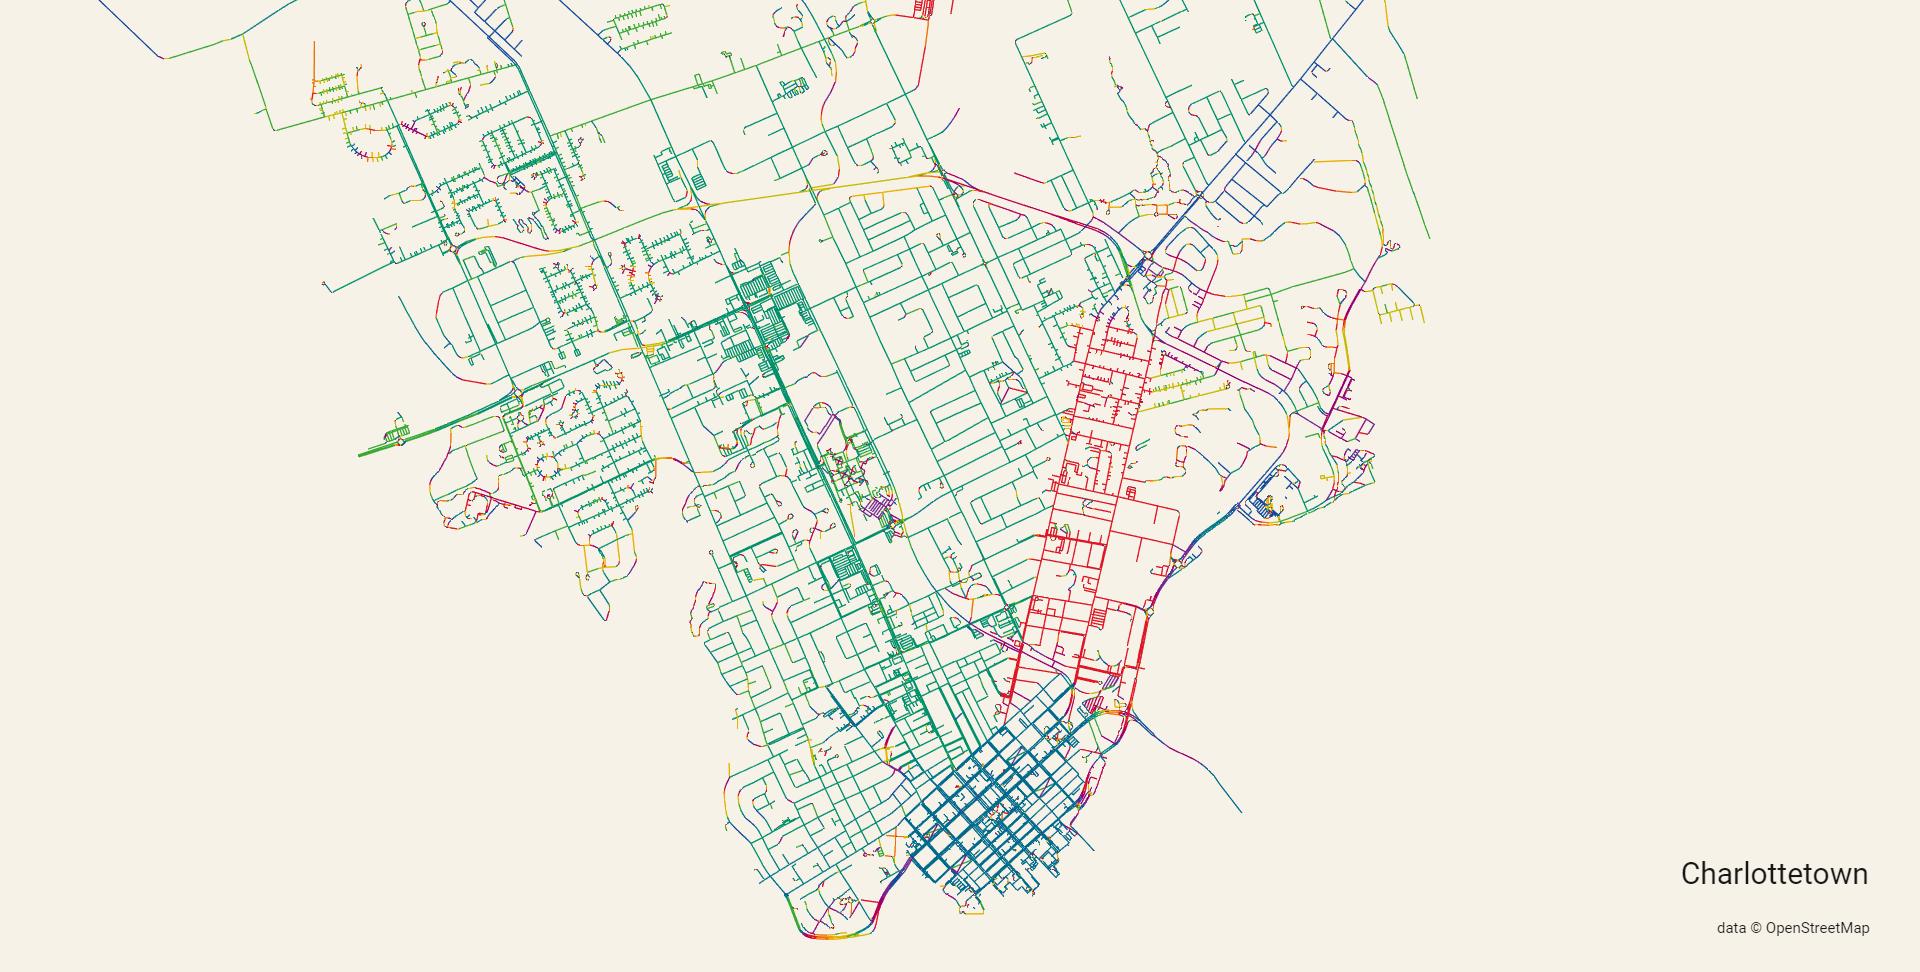 Map of Charlottetown